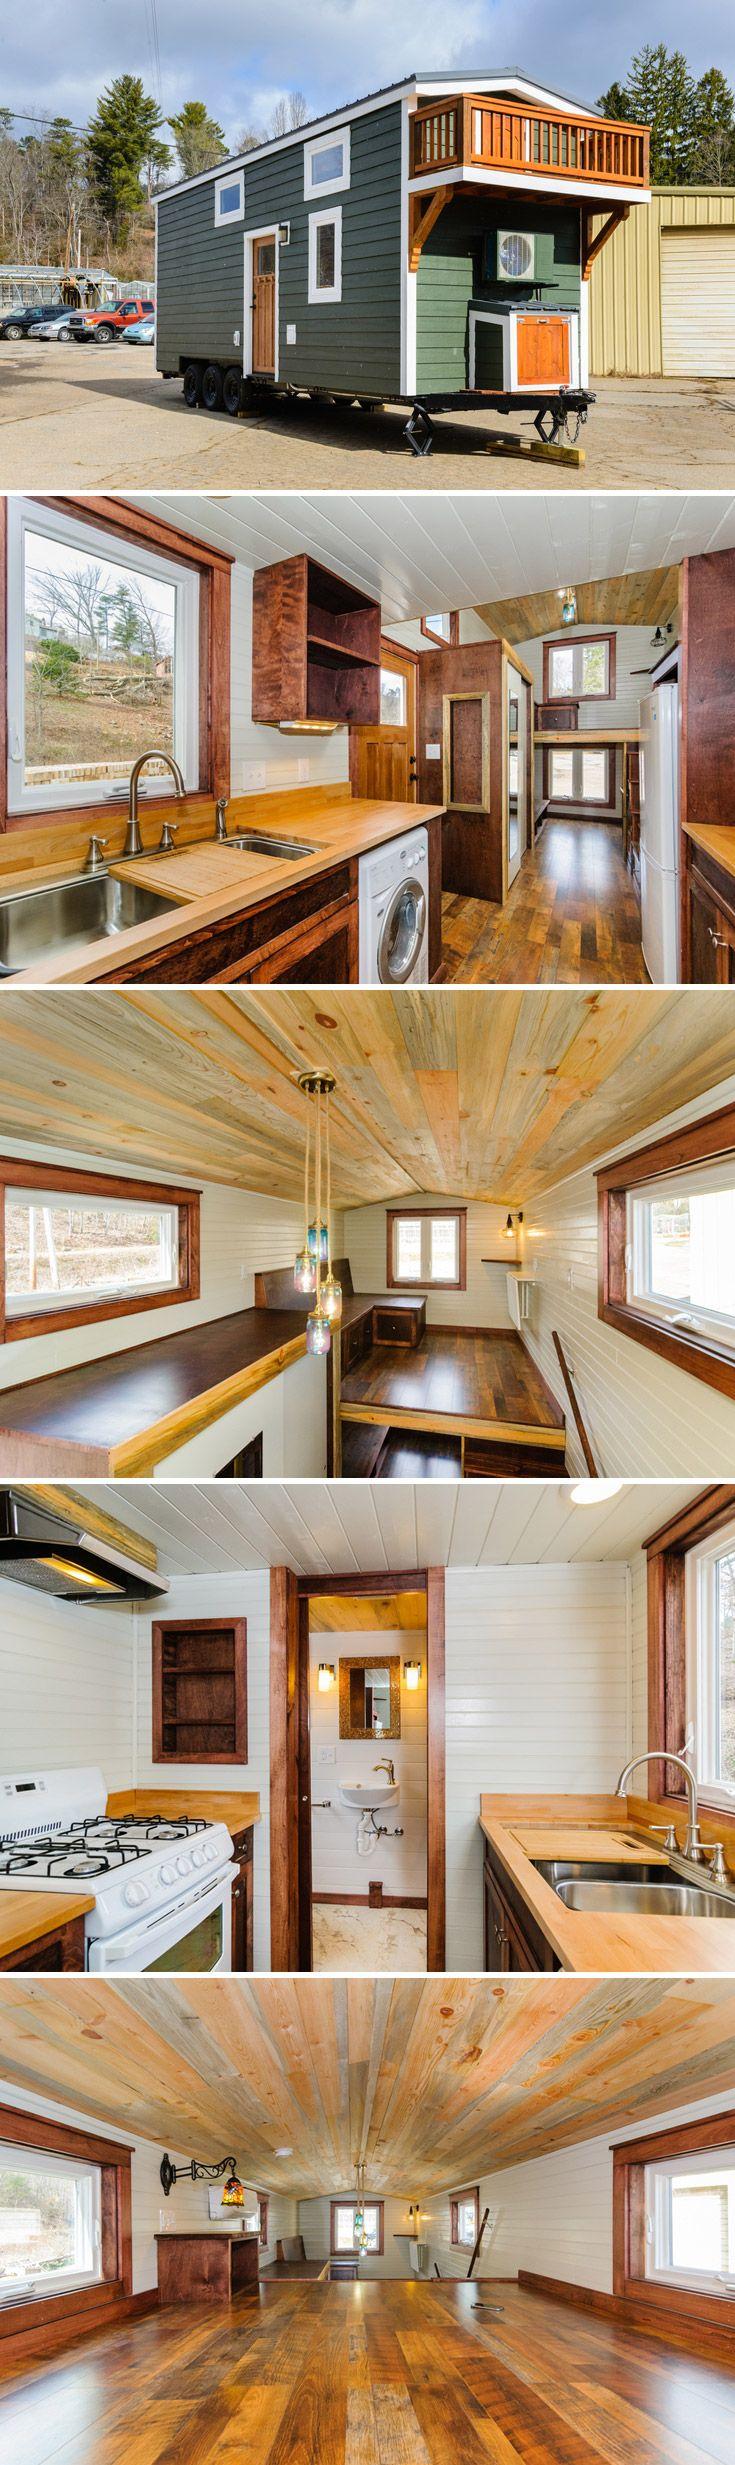 Homes On Wheels best 25+ tiny house on wheels ideas on pinterest | house on wheels